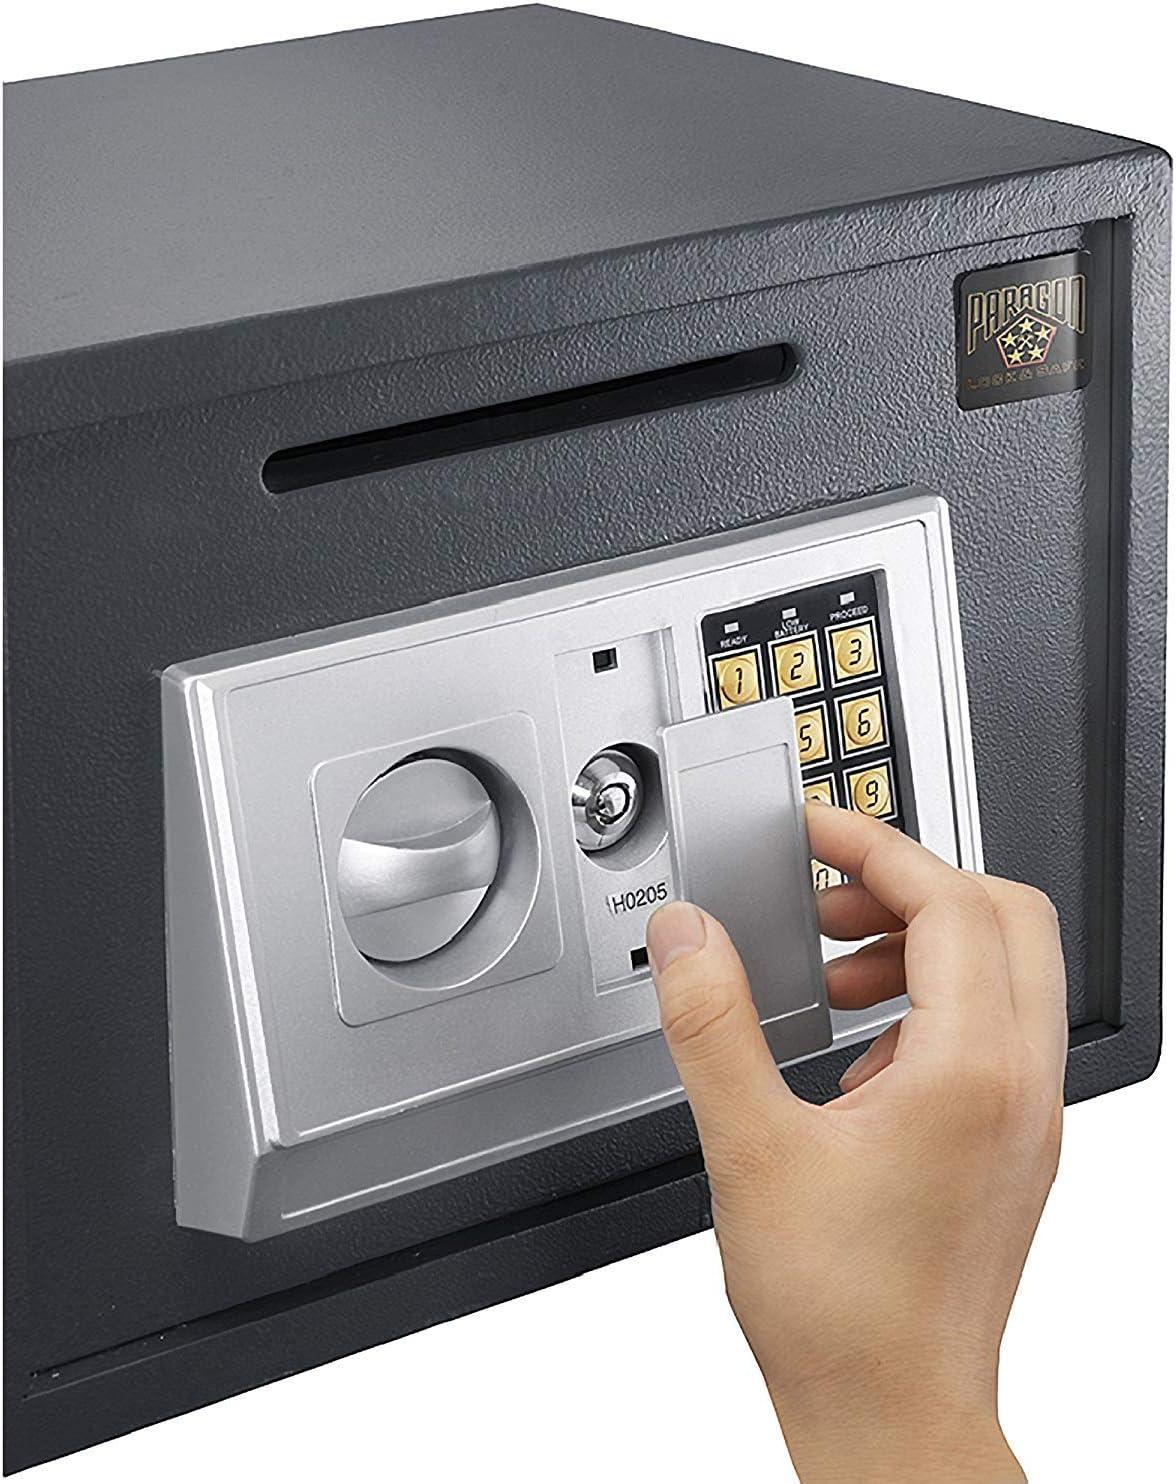 16 Litre Volume Home Digital Safes Electronic Heavy Duty Key Operated Security Money Cash Safe Box Grey Large w// 2 keys